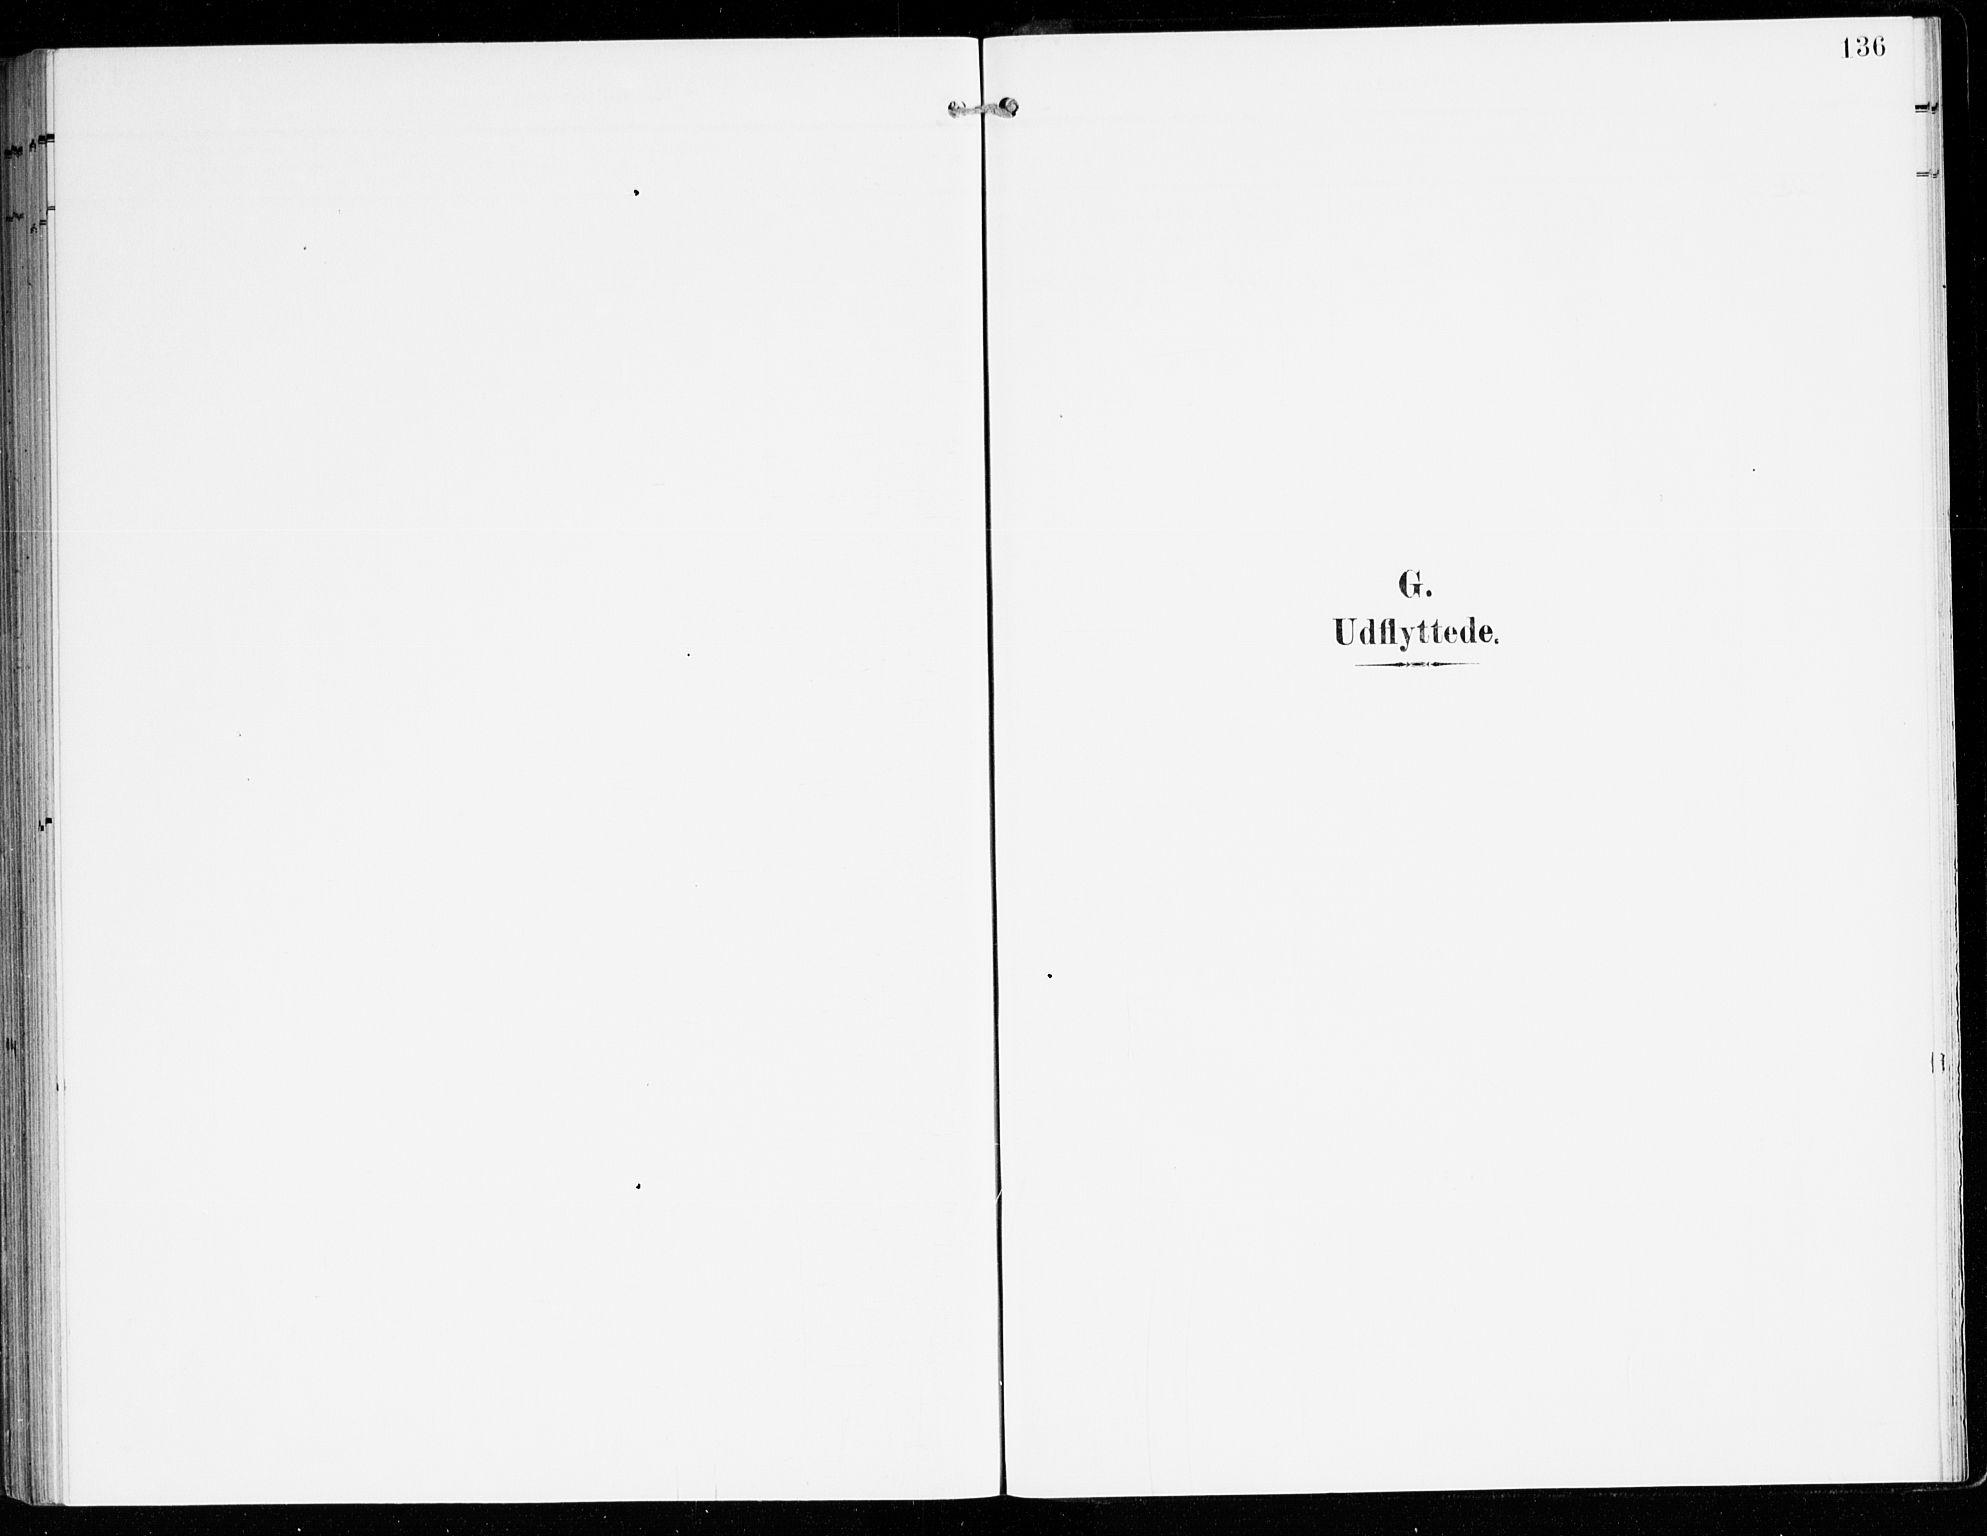 SAB, Hyllestad Sokneprestembete, Ministerialbok nr. D 2, 1905-1919, s. 136